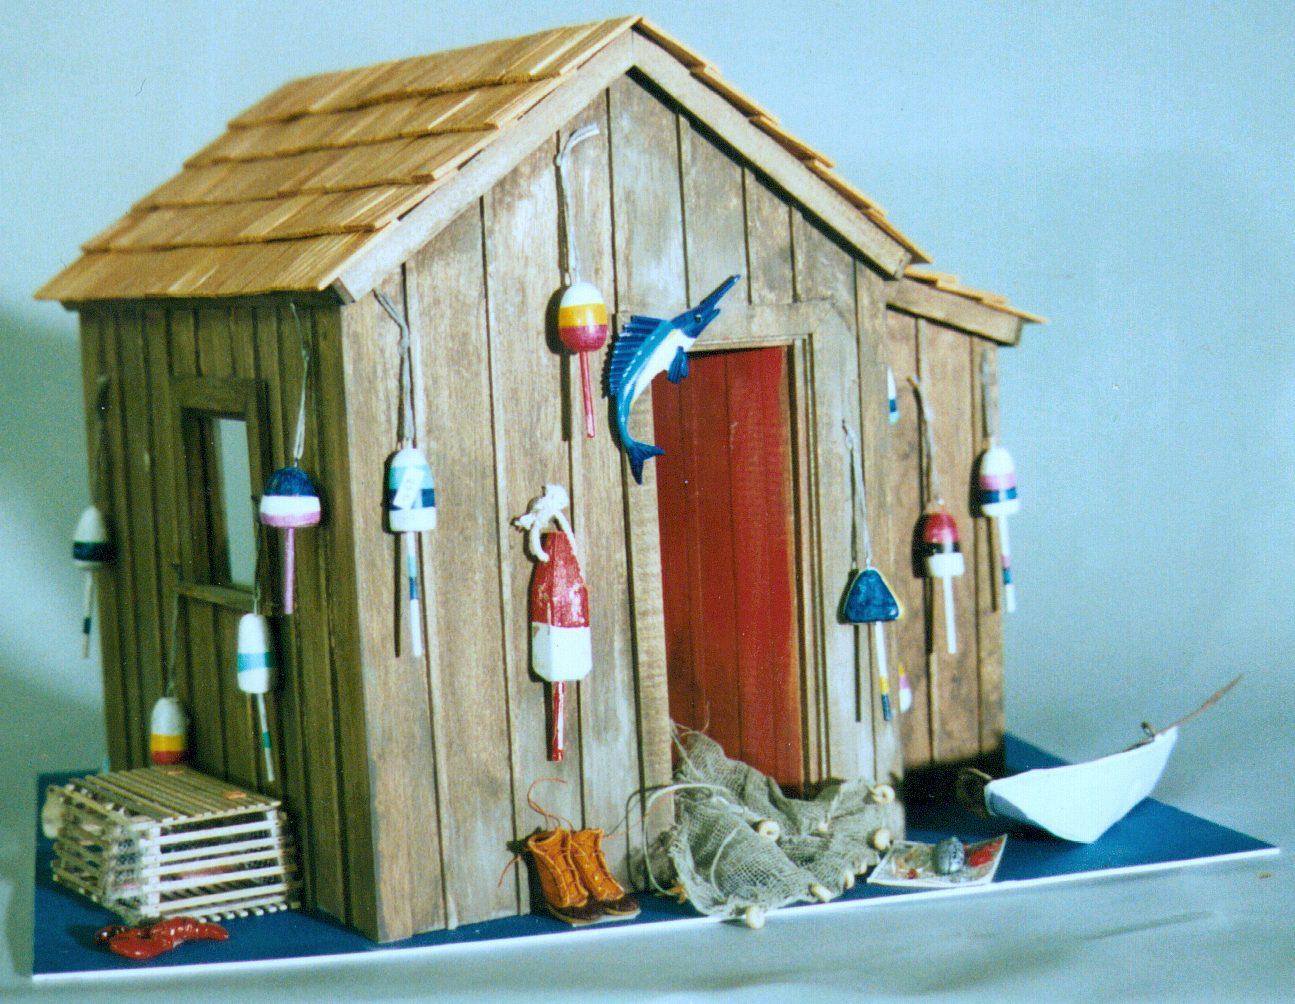 Seabrook Dollhouse Kit 35 00 Miniature Dollhouses